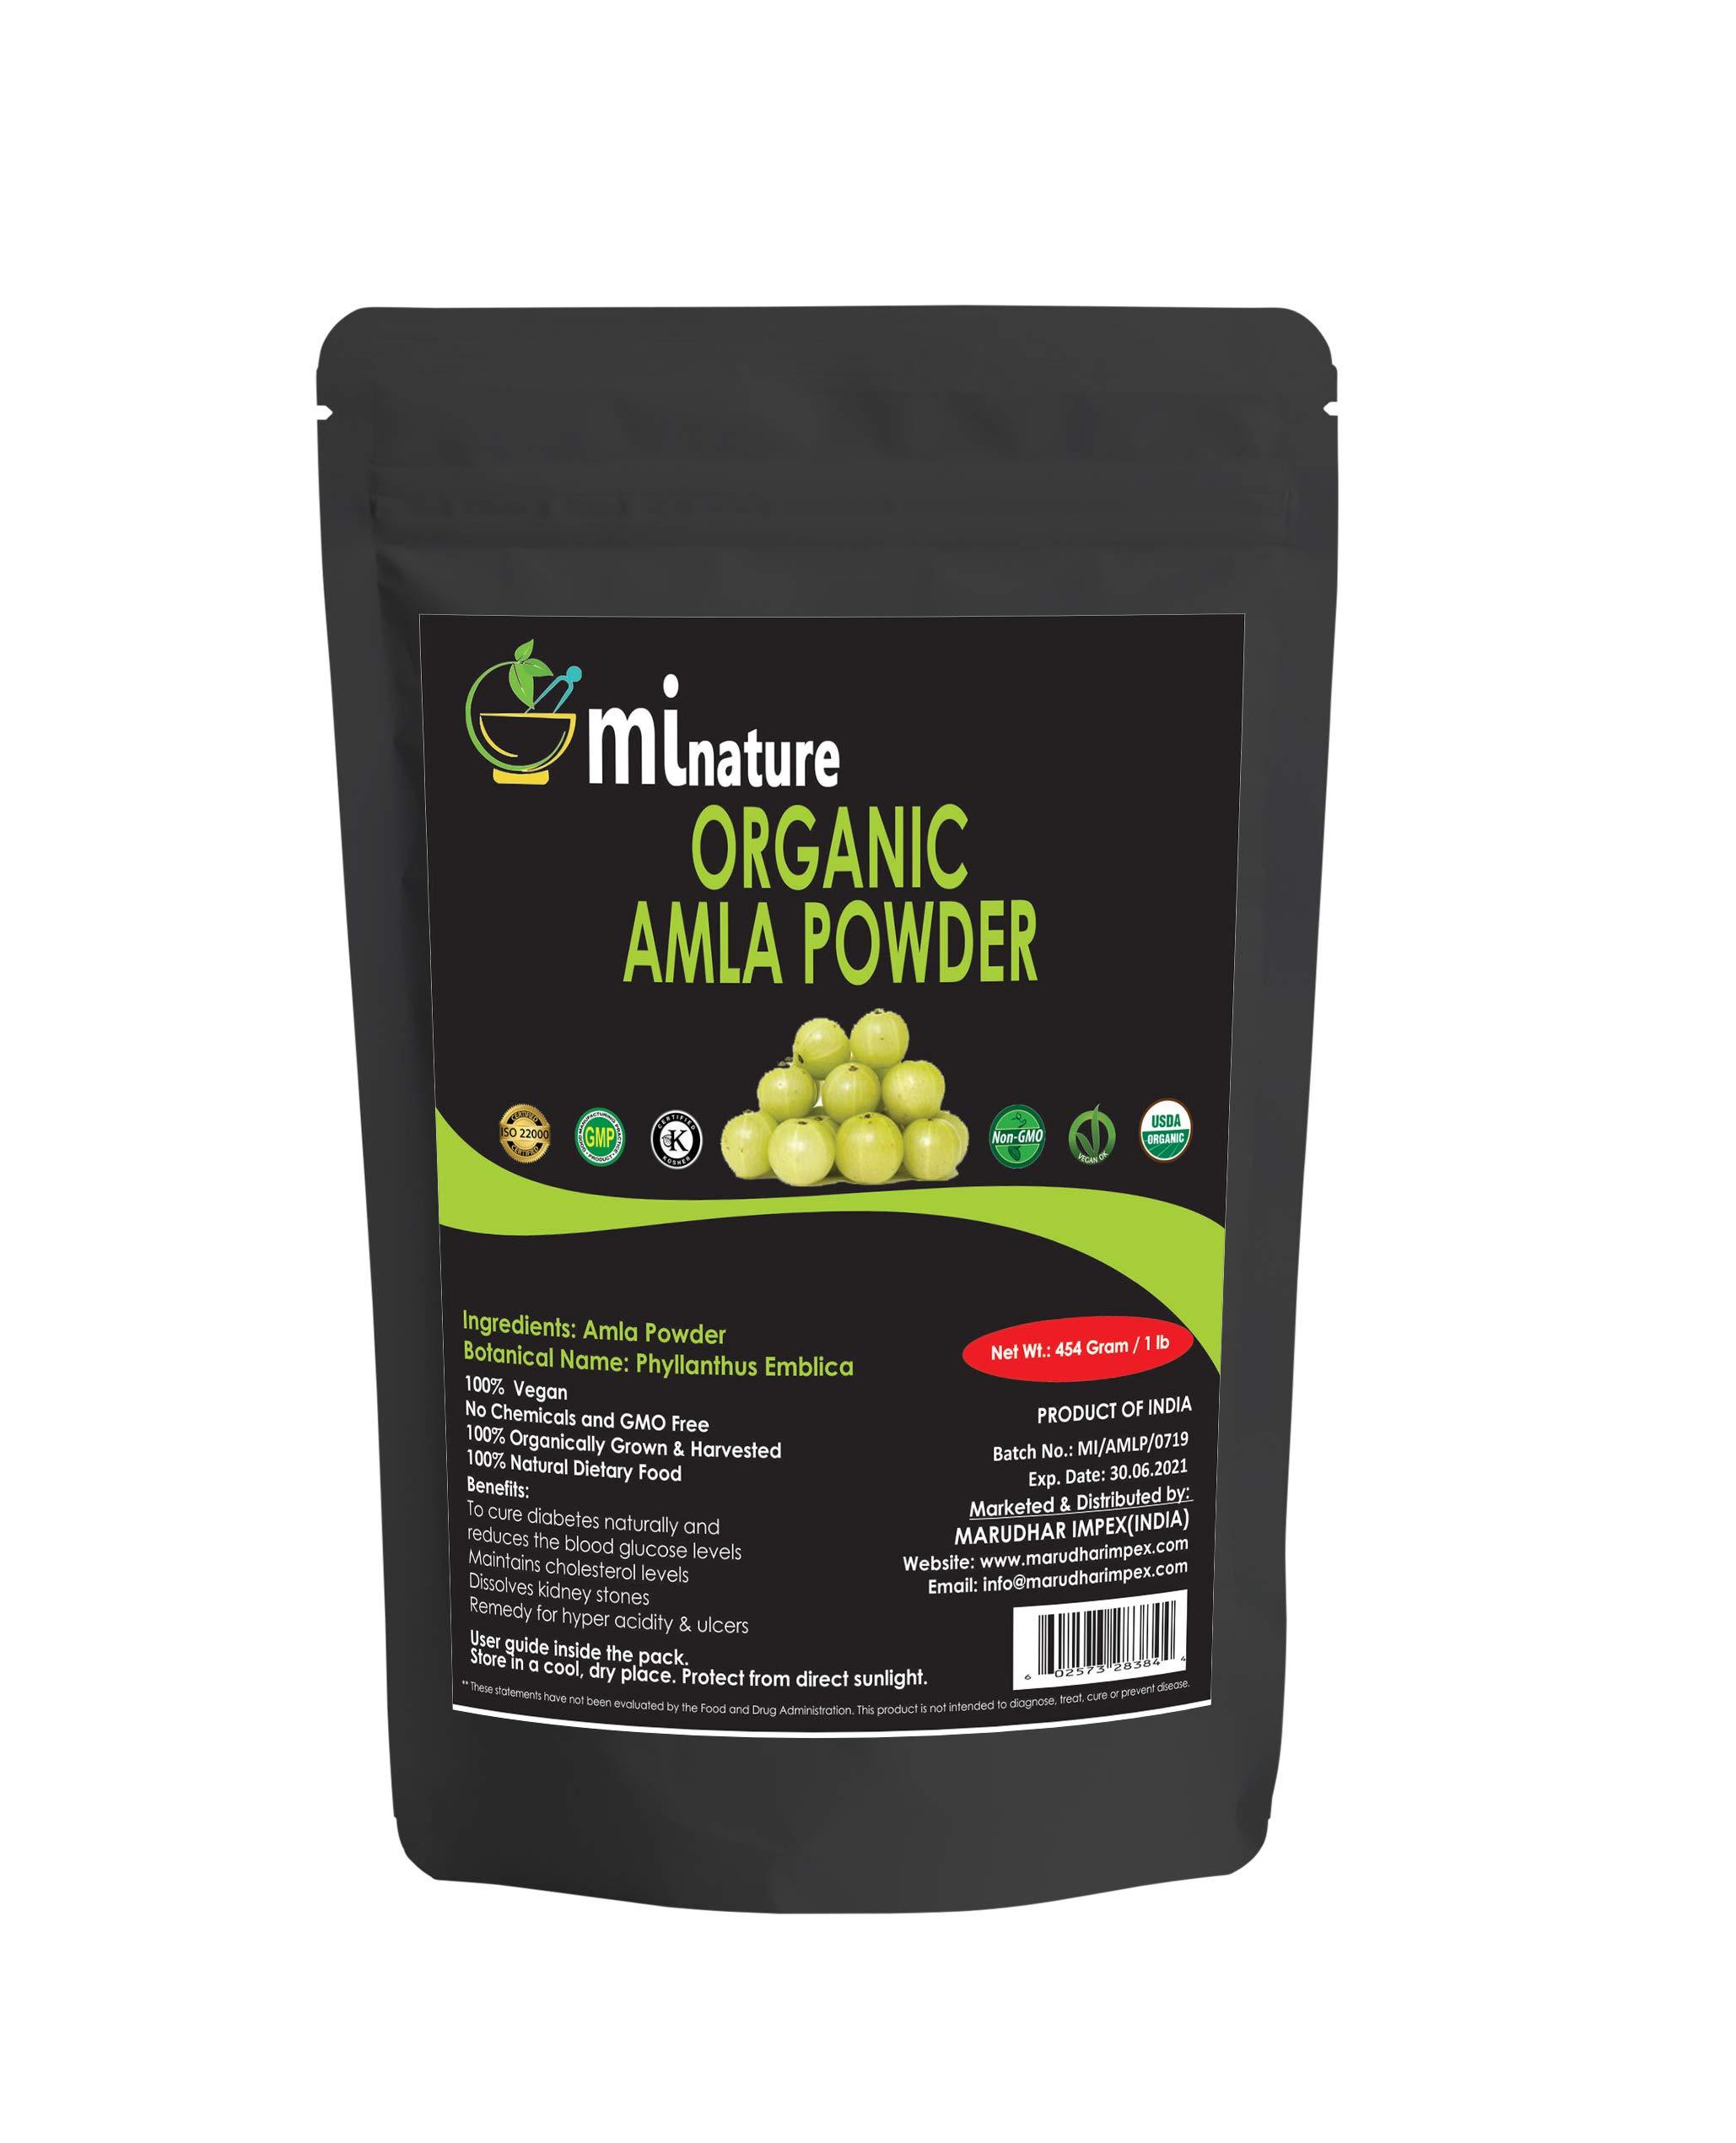 USDA NOP Certified Organic Amla Powder, 100% Organic Indian Gooseberry, Emblica Officinails, Vegan, for Cooling, Skincare, 16oz by mi nature